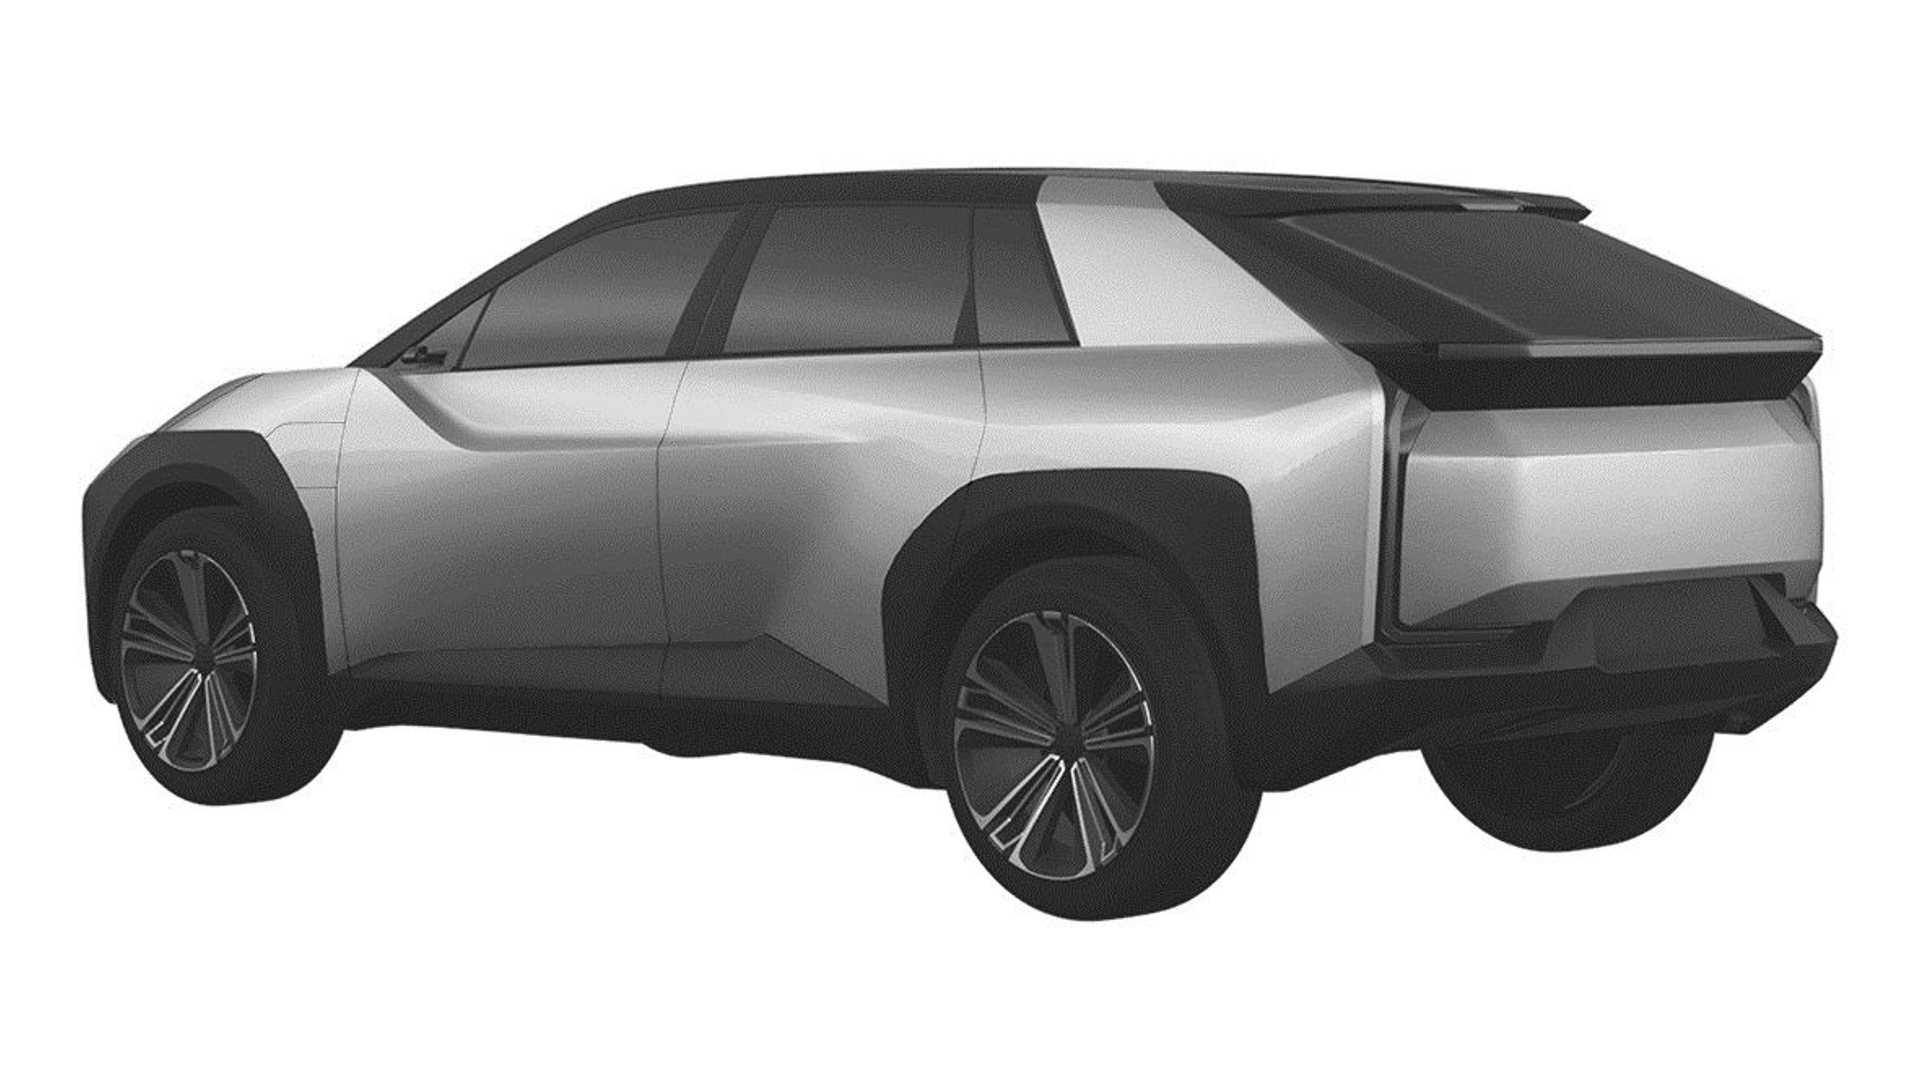 Toyota-Crossover-Design-Trademark-patents-2